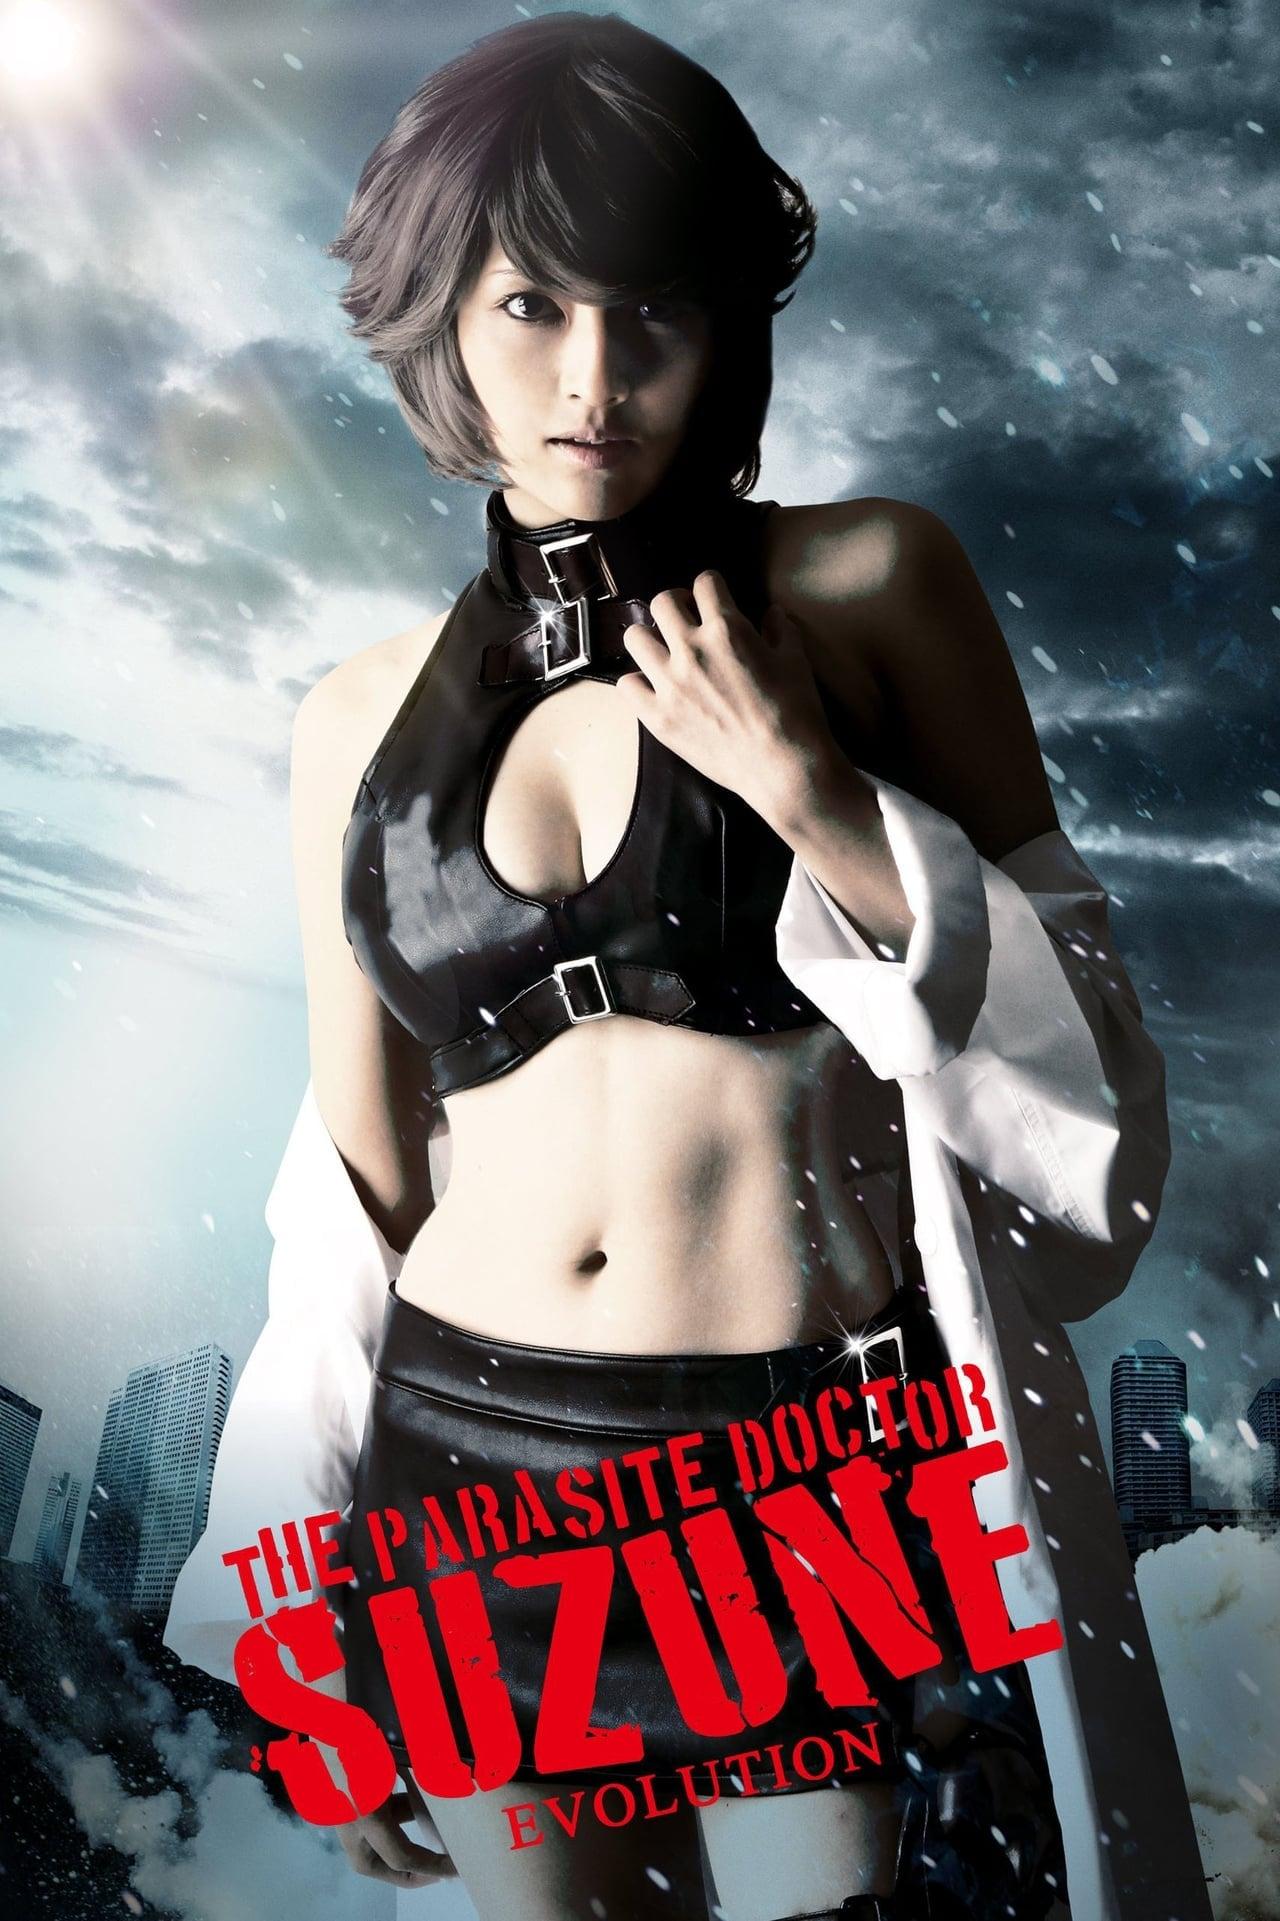 The Parasite Doctor Suzune: Evolution